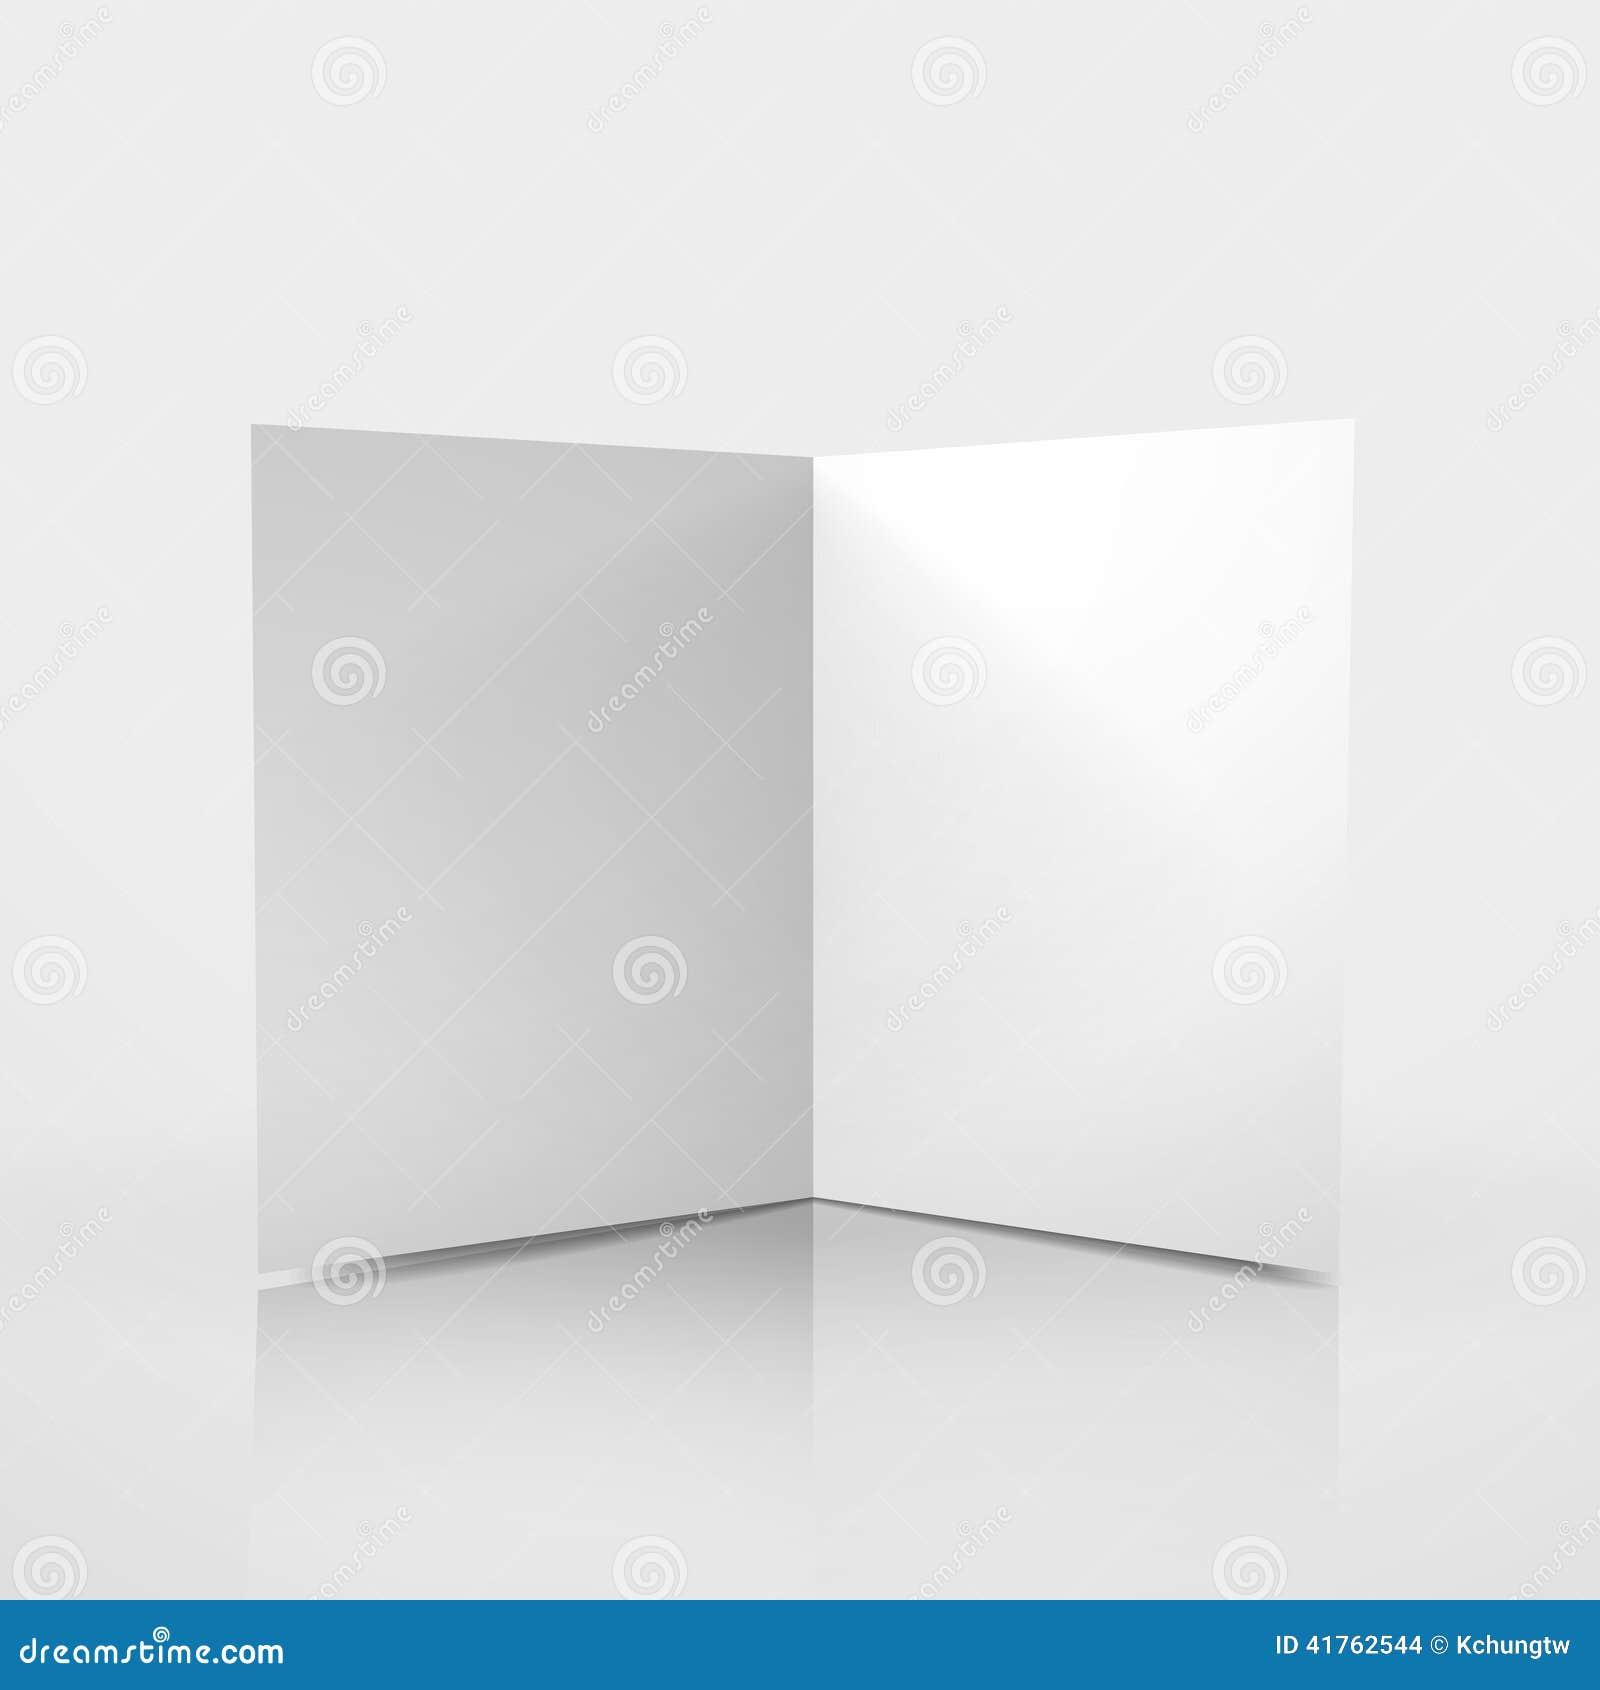 3d Vector Blank Card Template Stock Vector - Image: 41762544